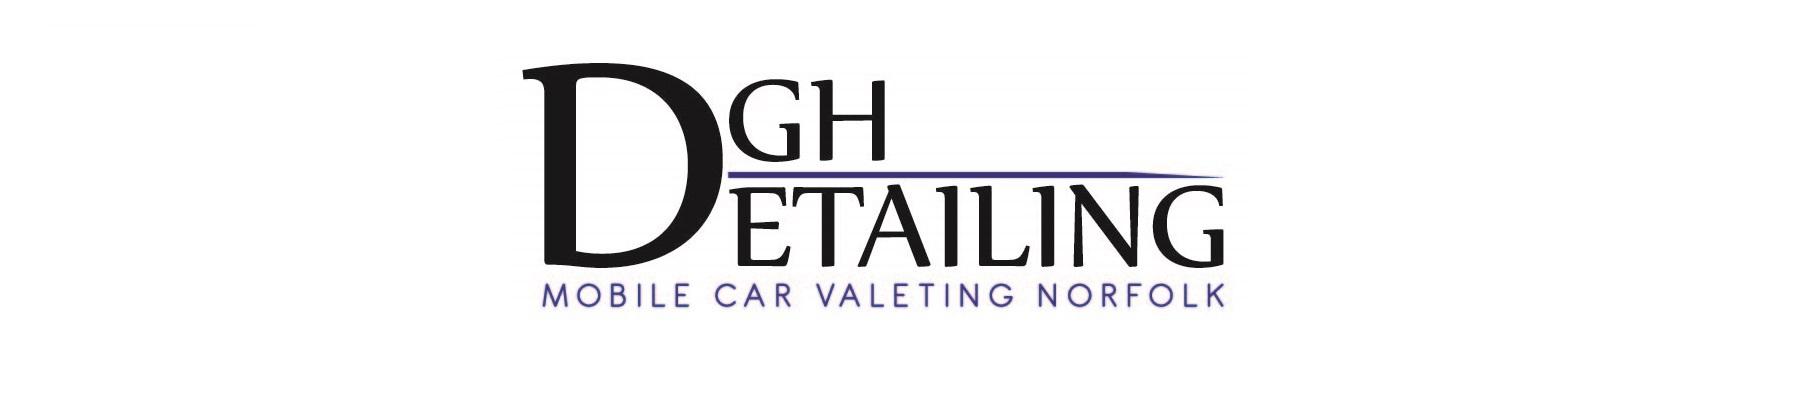 DGH Detailing mobile car valeting